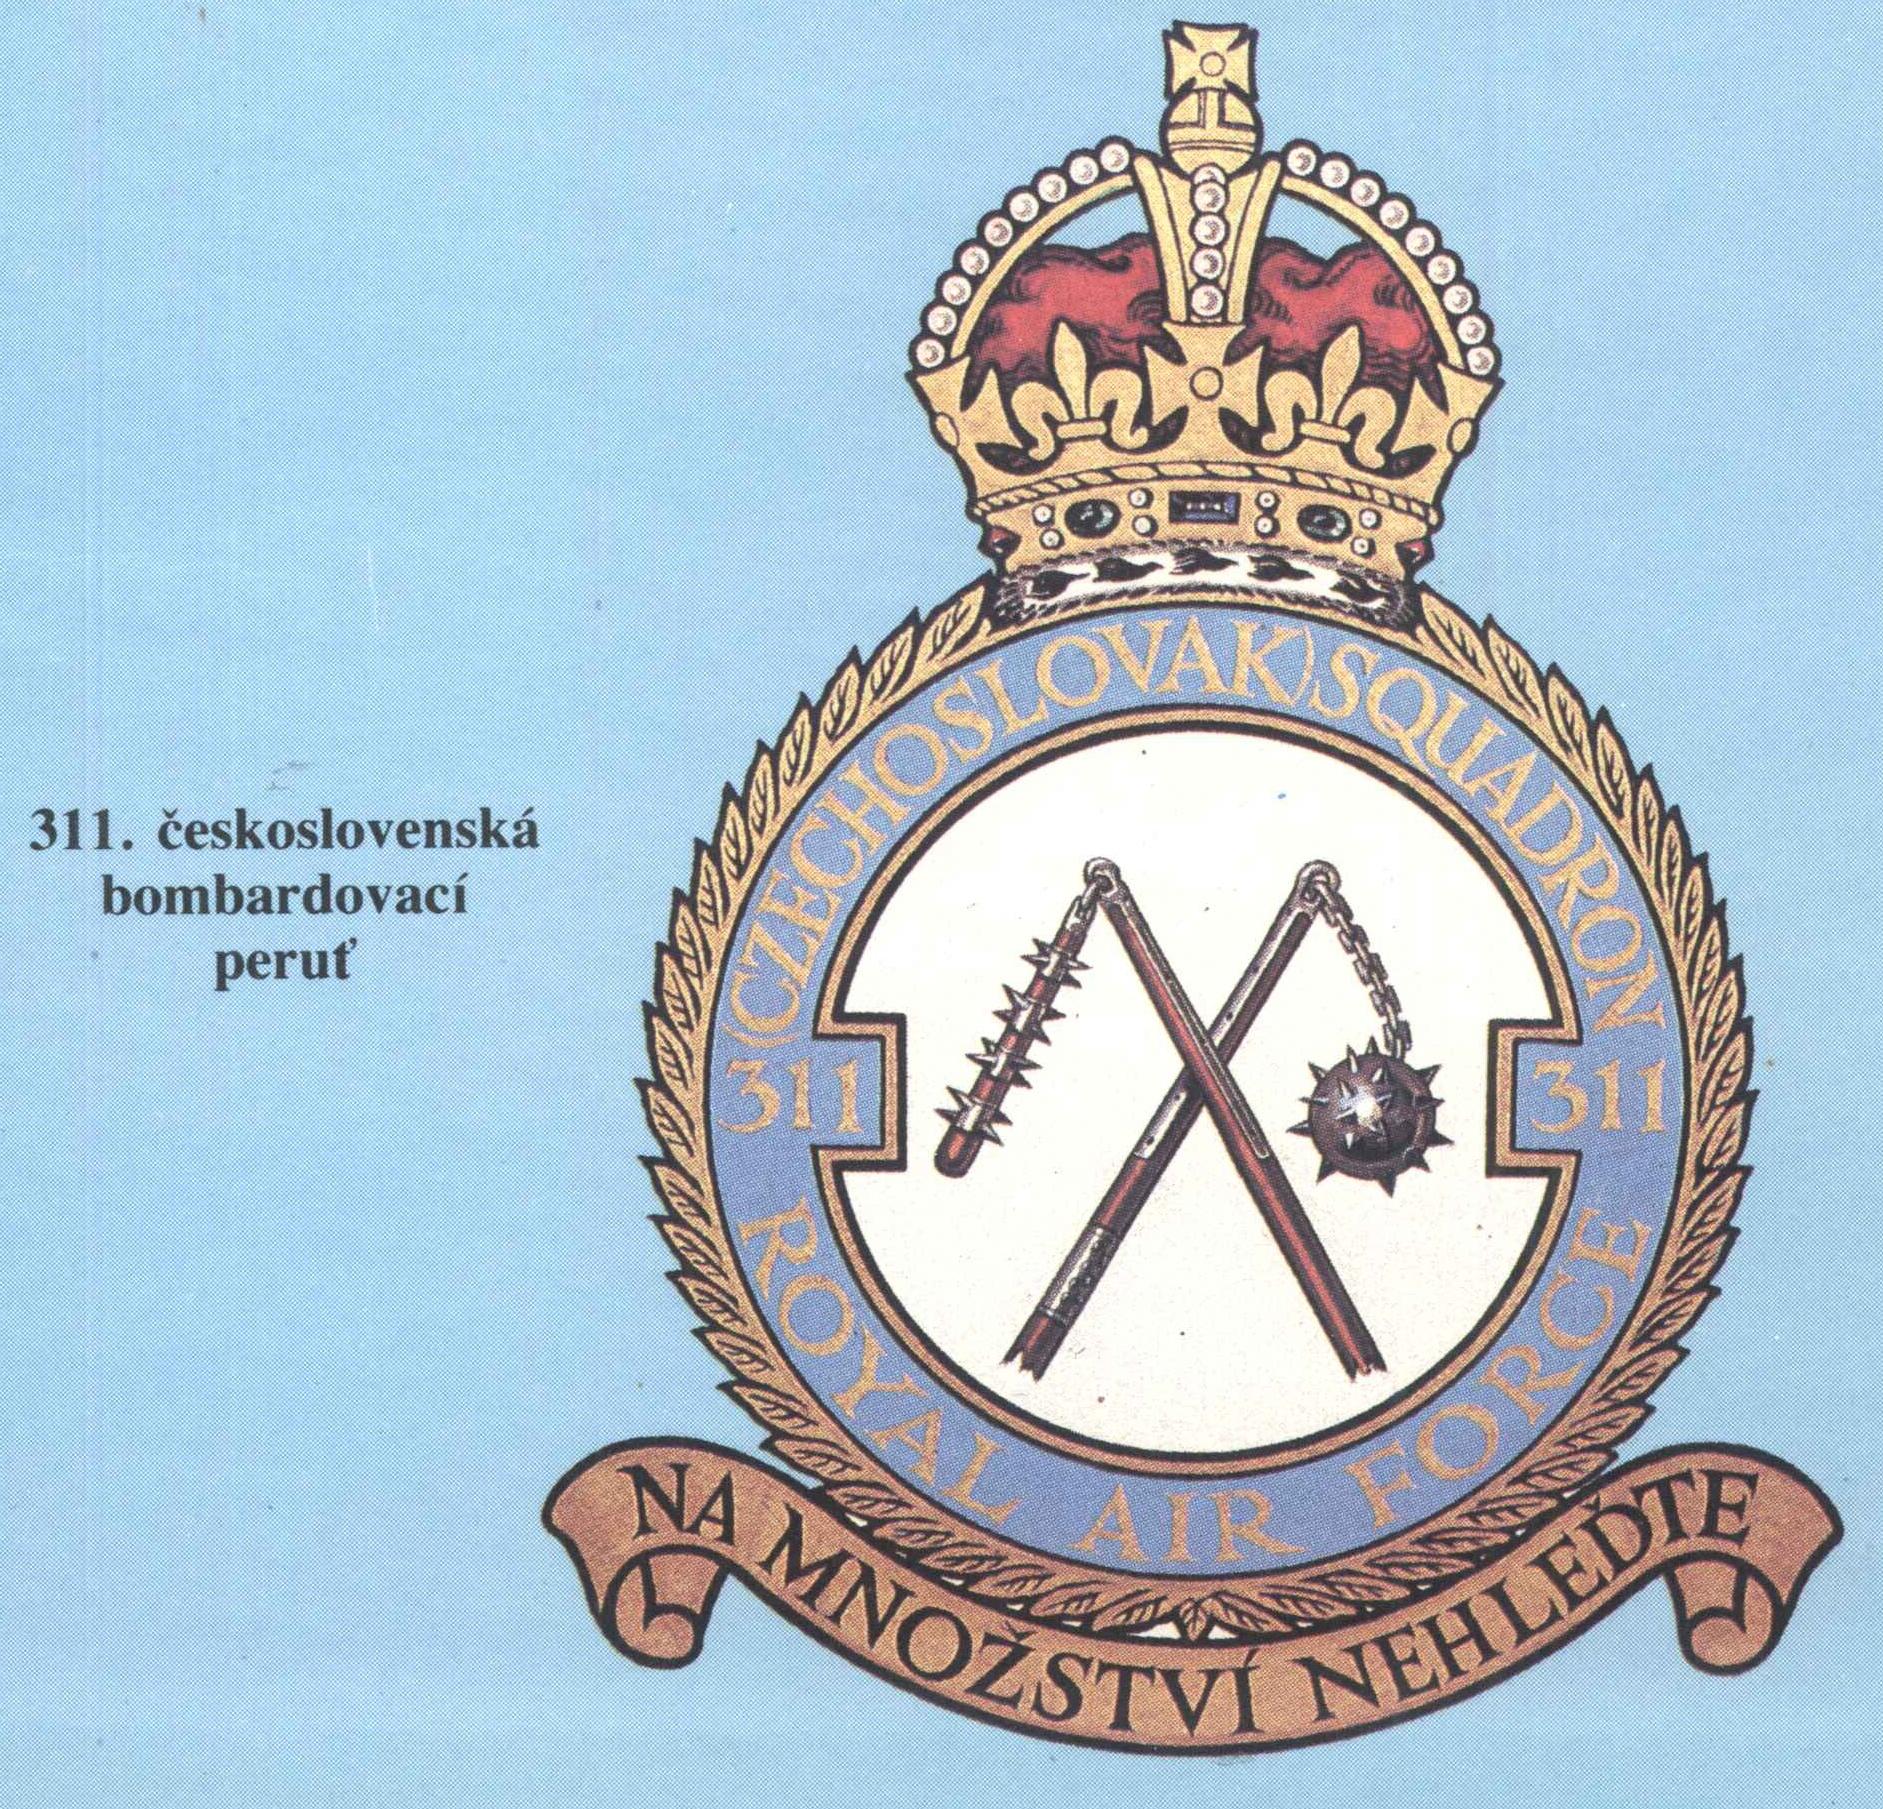 Znak_311.bombardovaci_perute_RAF_002